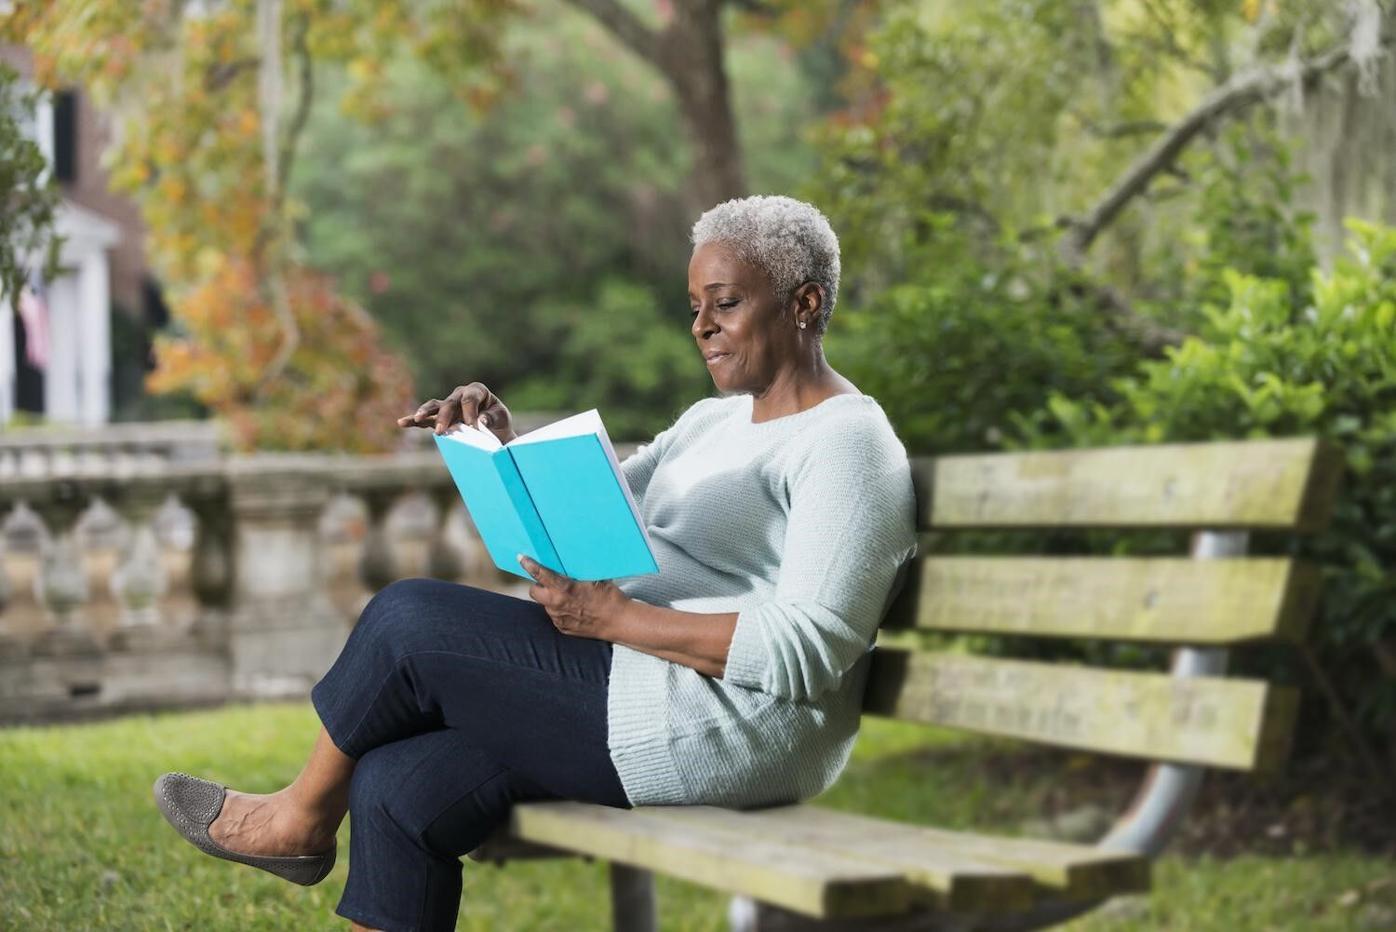 Lady on park bench reading.jpg